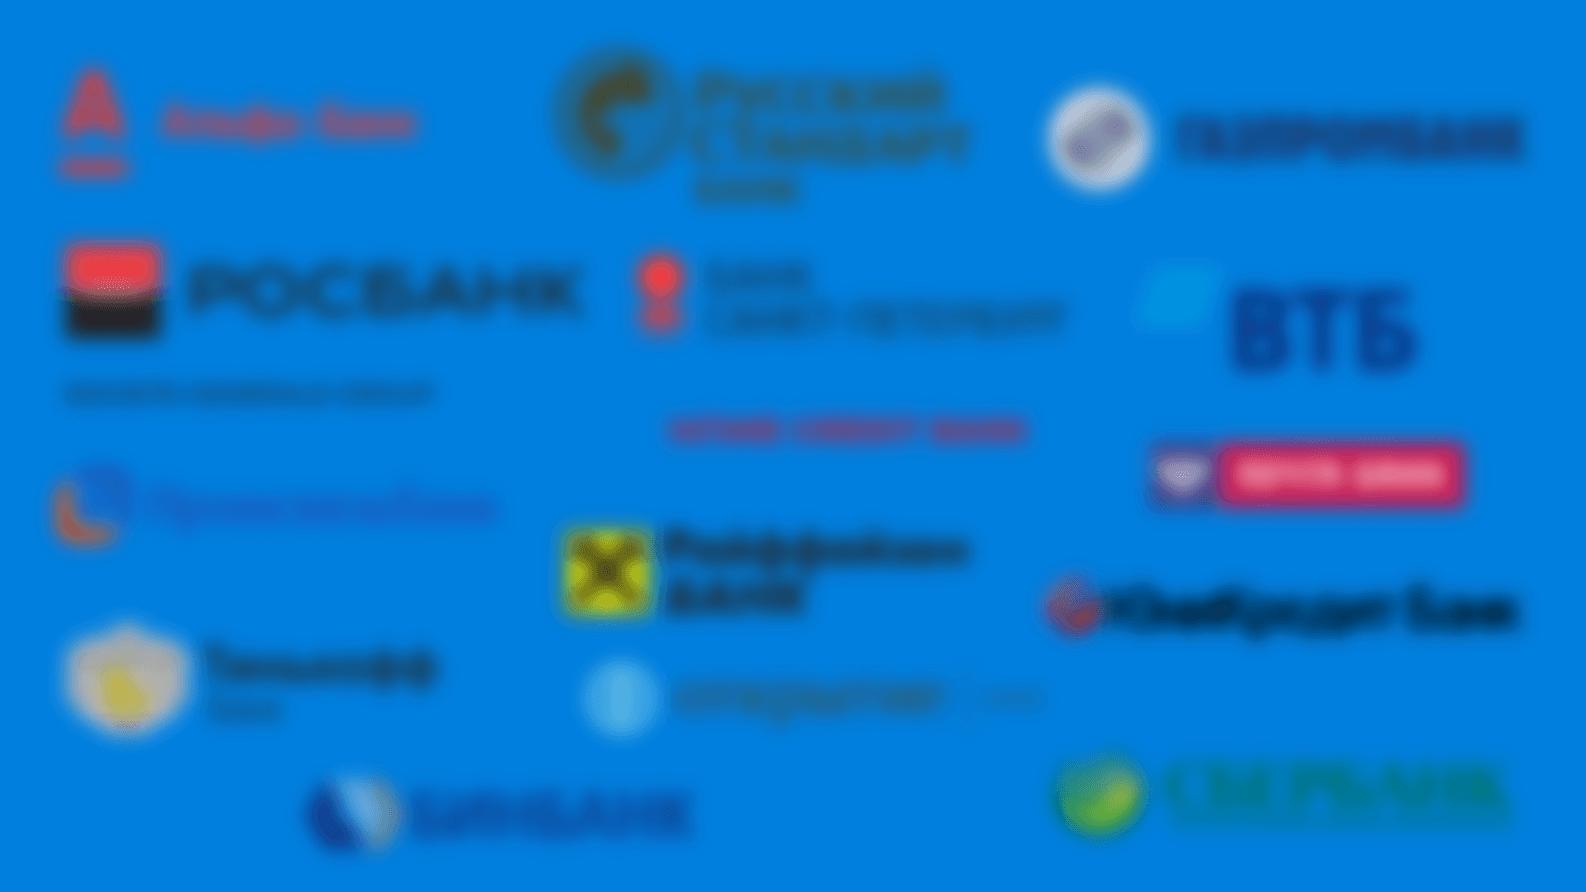 Мониторинг банковских iOS-приложений за март: автоплатежи